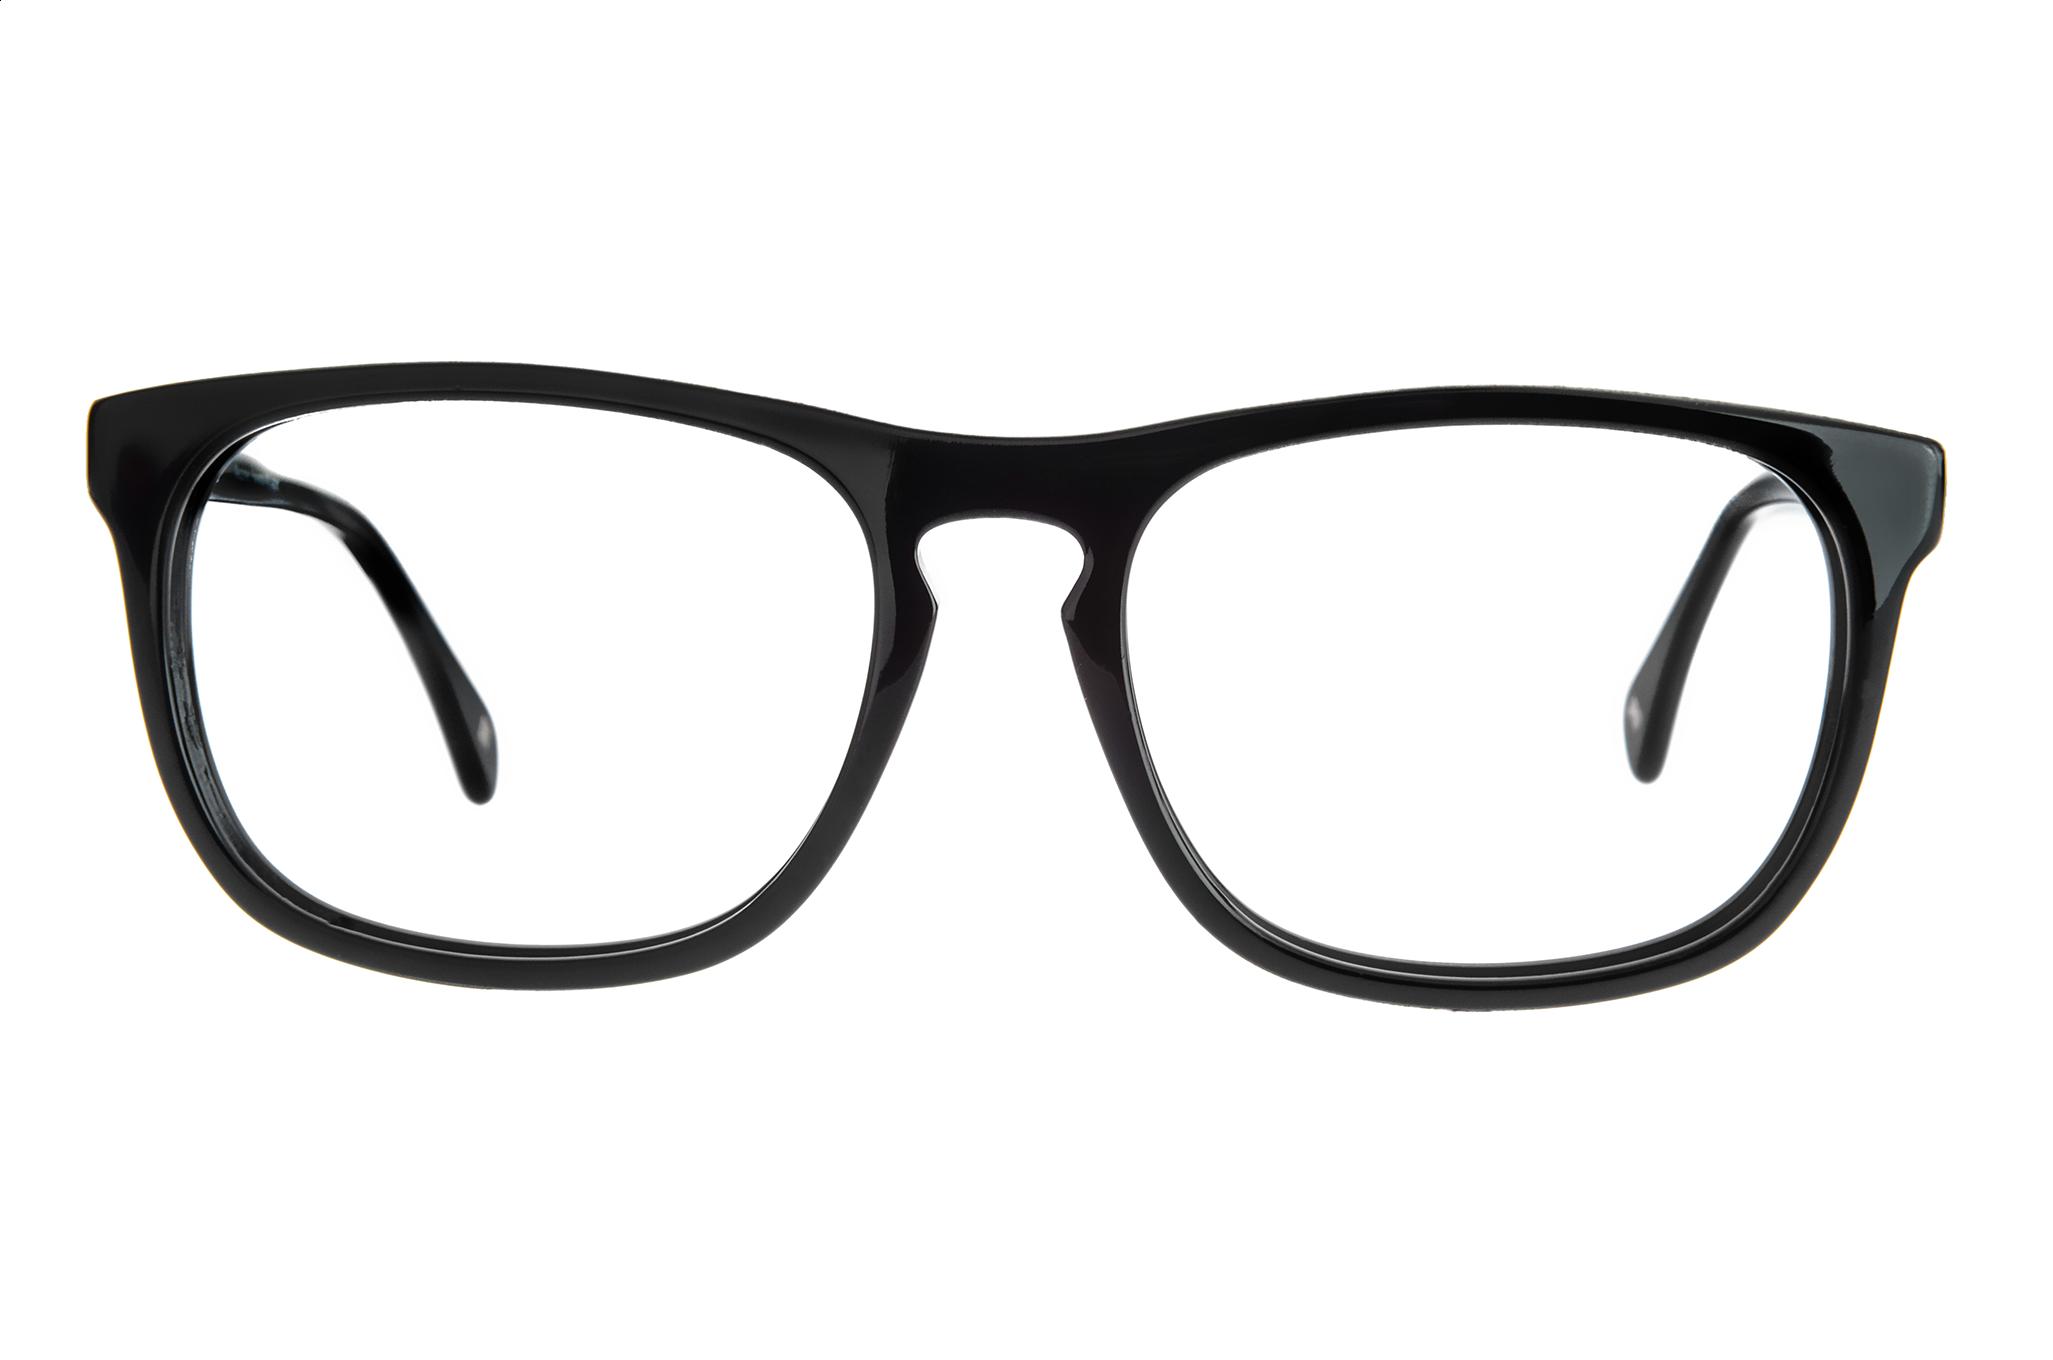 Glasses Png Image Glasses Black Eyeglasses Frames Eyeglasses